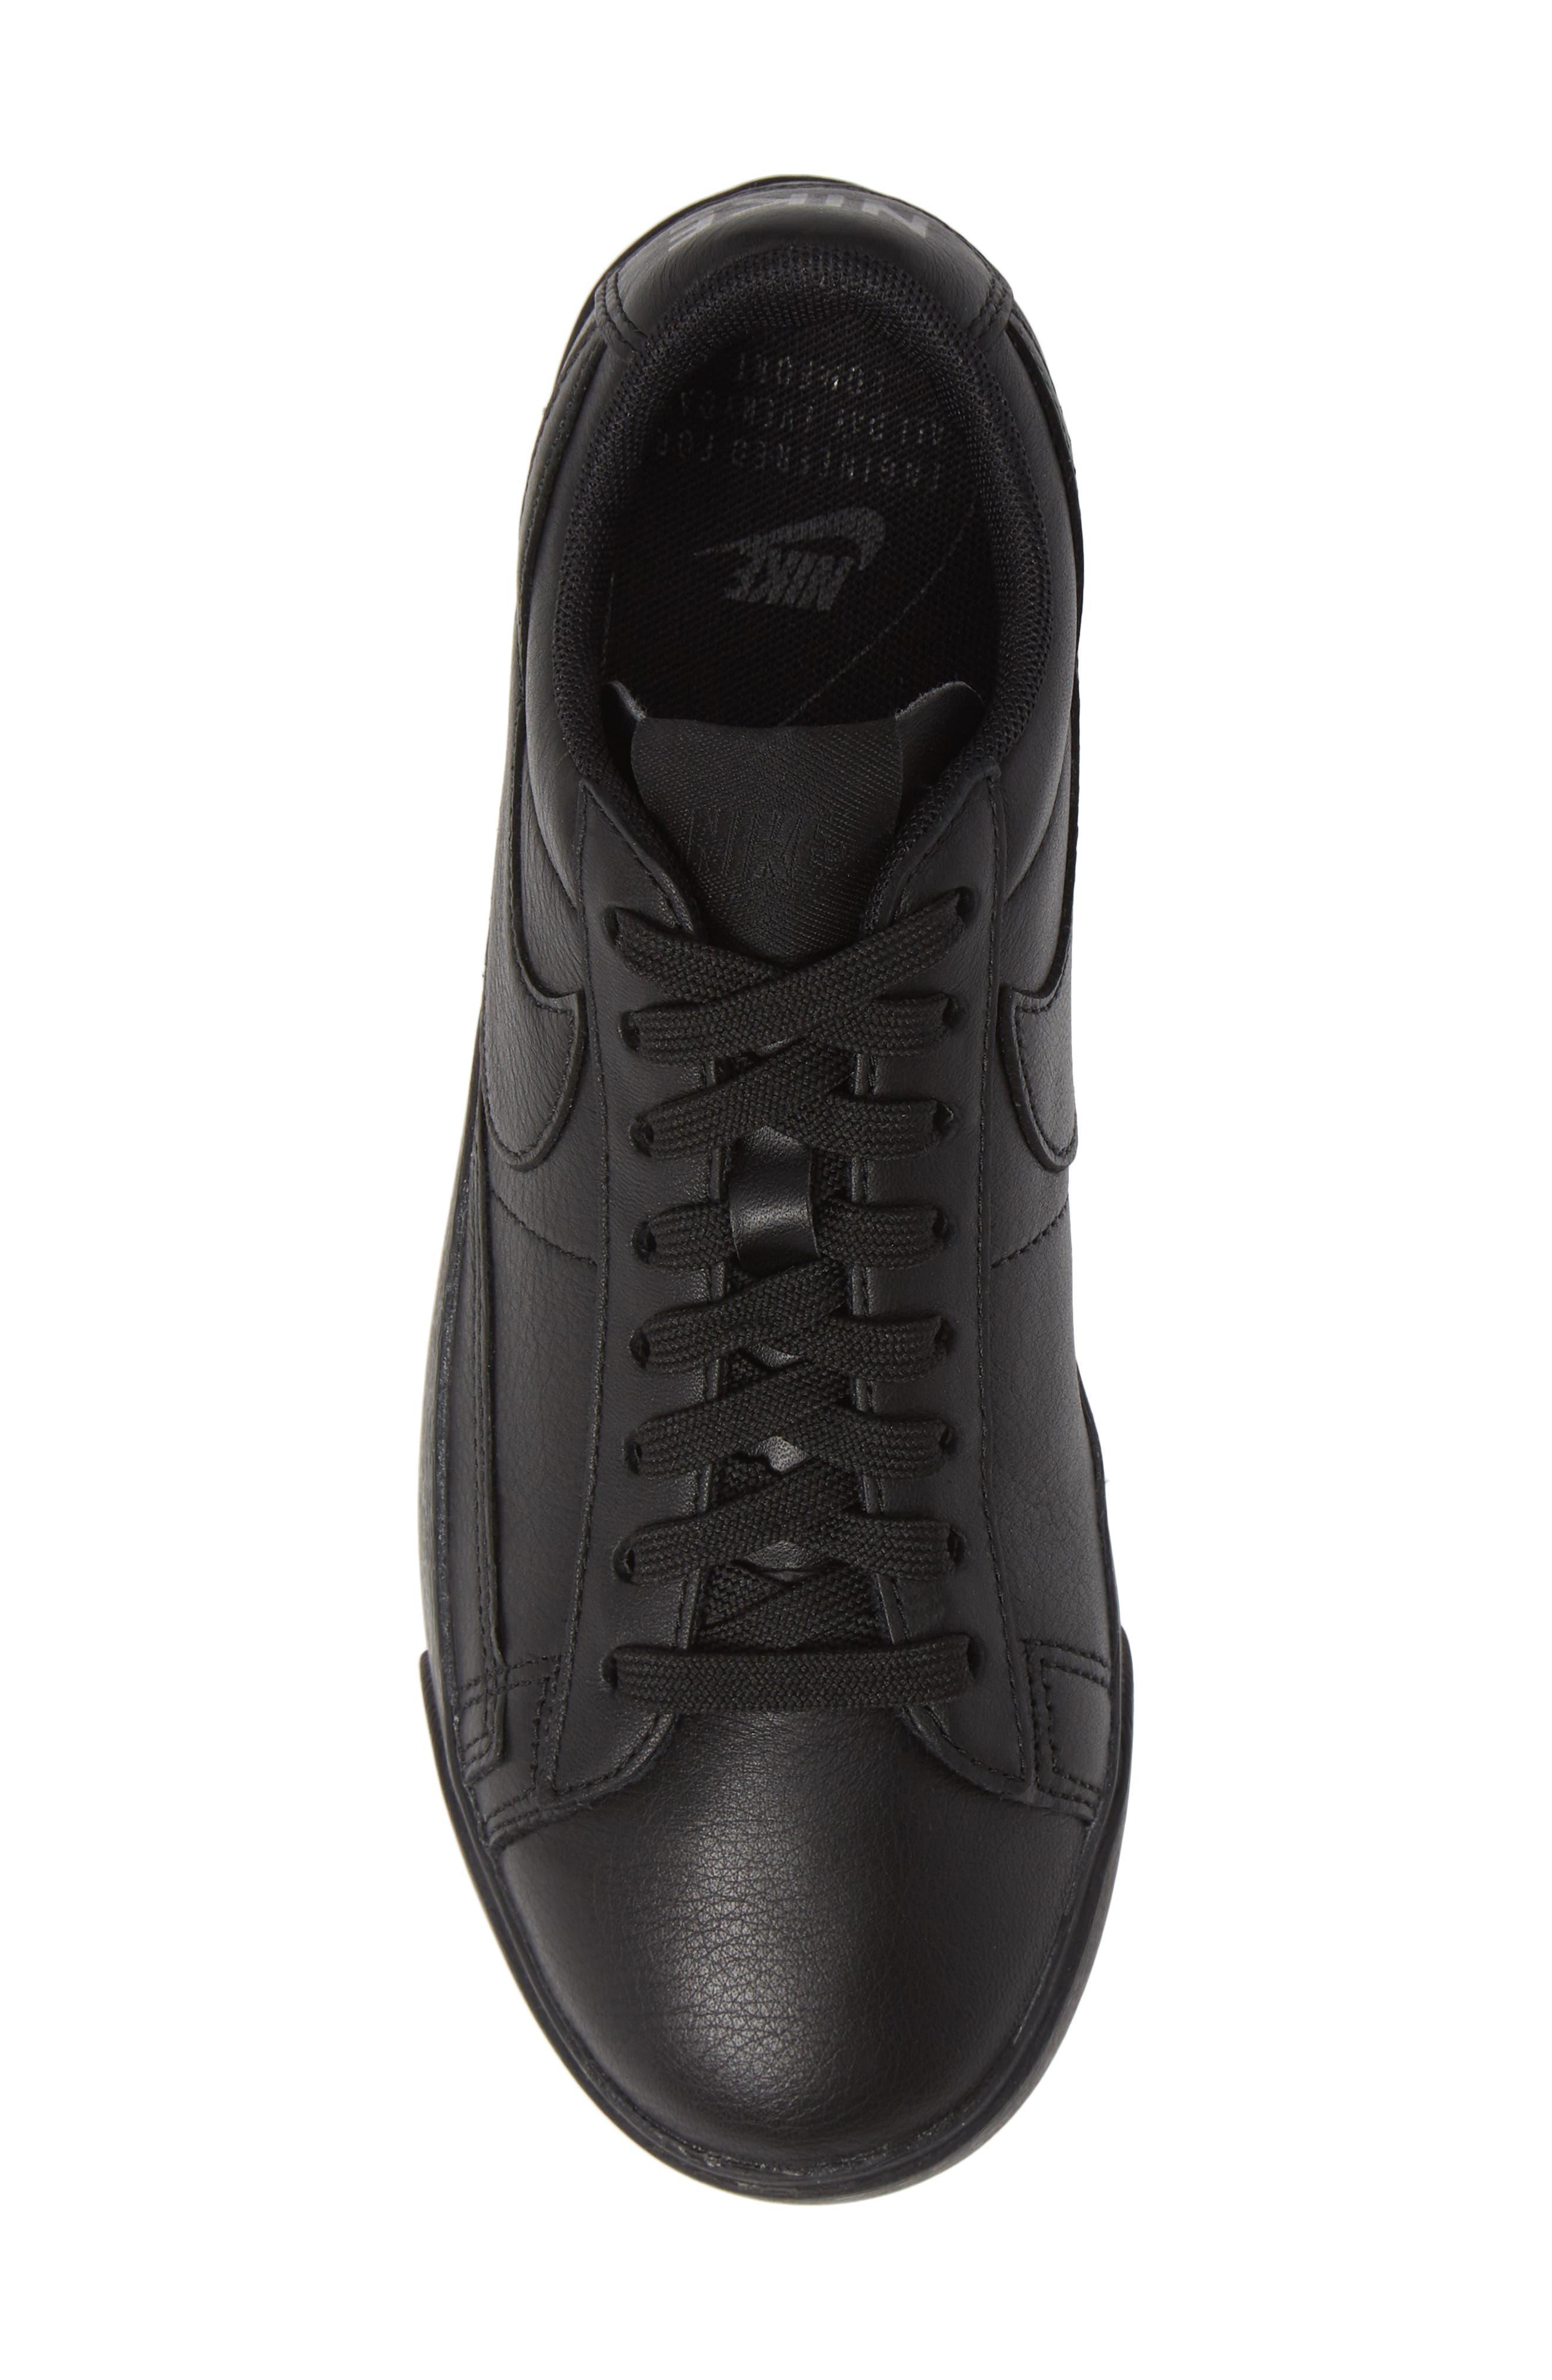 Blazer Low SE Sneaker,                             Alternate thumbnail 5, color,                             BLACK/ BLACK-BLACK